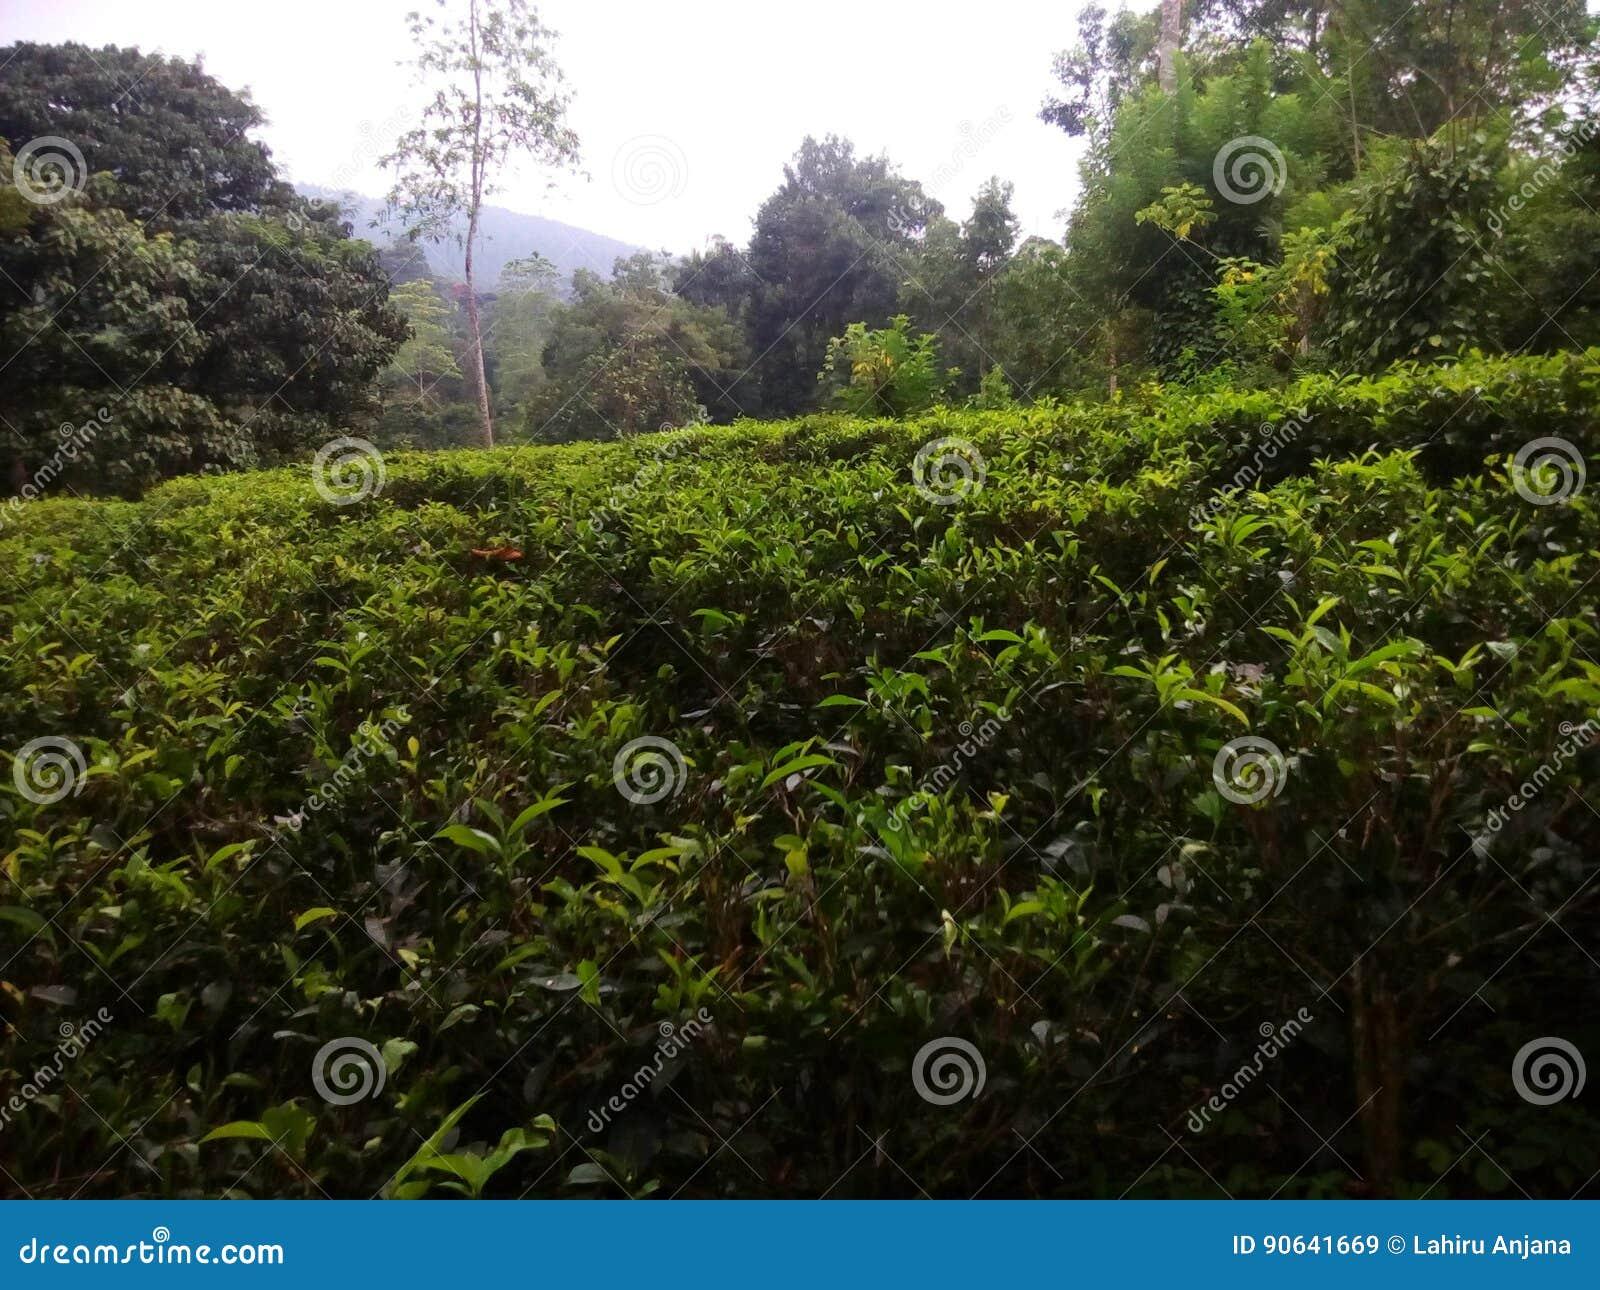 Srilankan tea